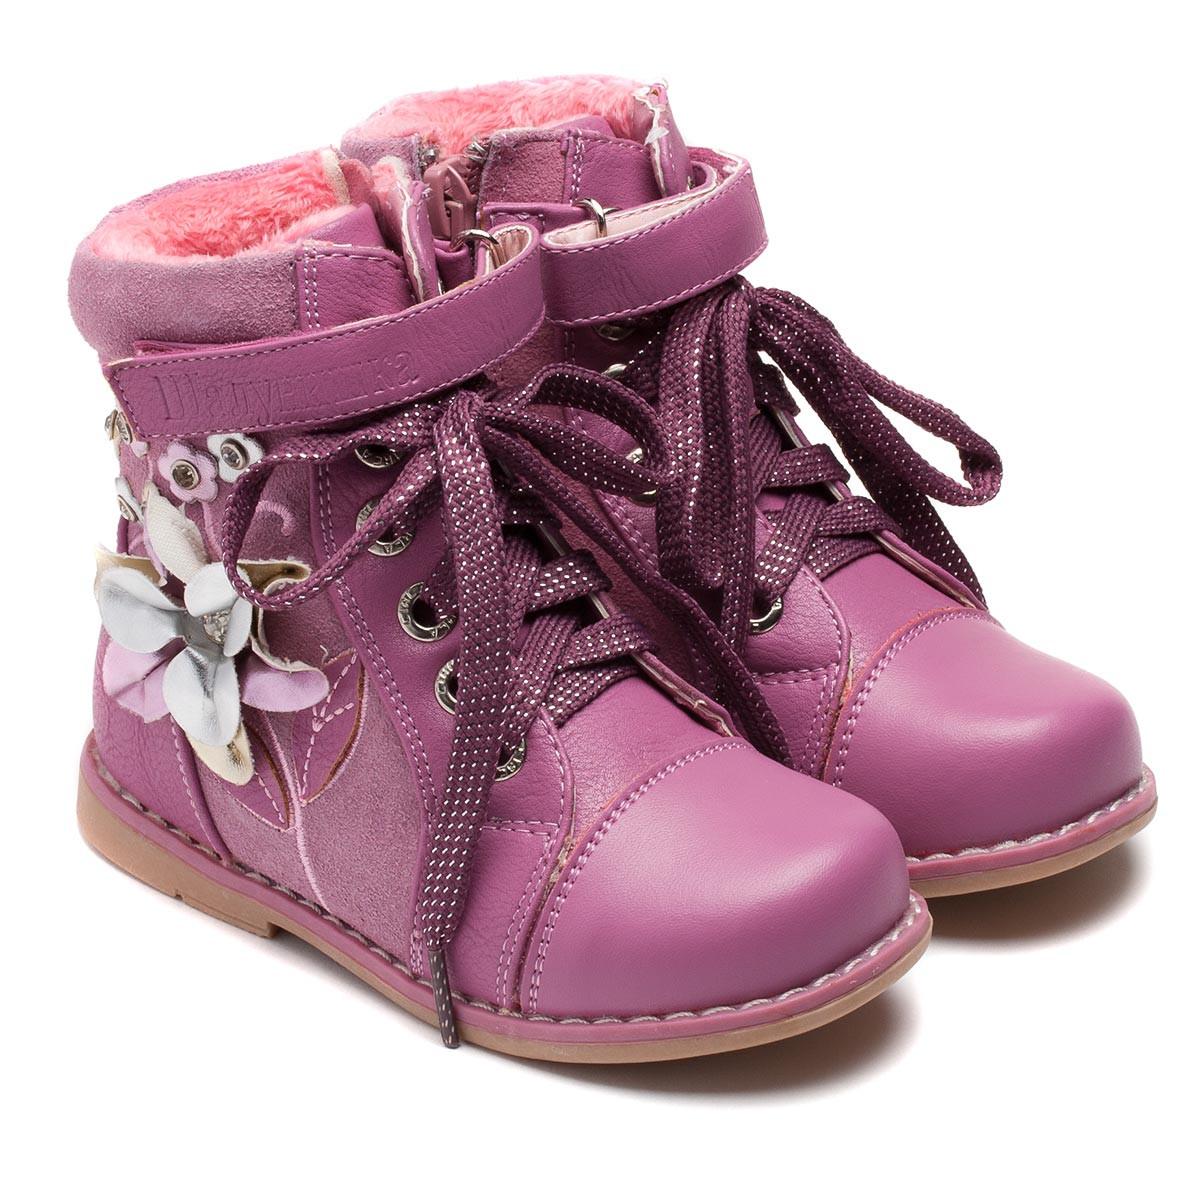 448d48ffa Весенние сапоги Шалунишка - Ортопед для девочки, размер 24-29 - Детская  обувь ORTOPEDIC